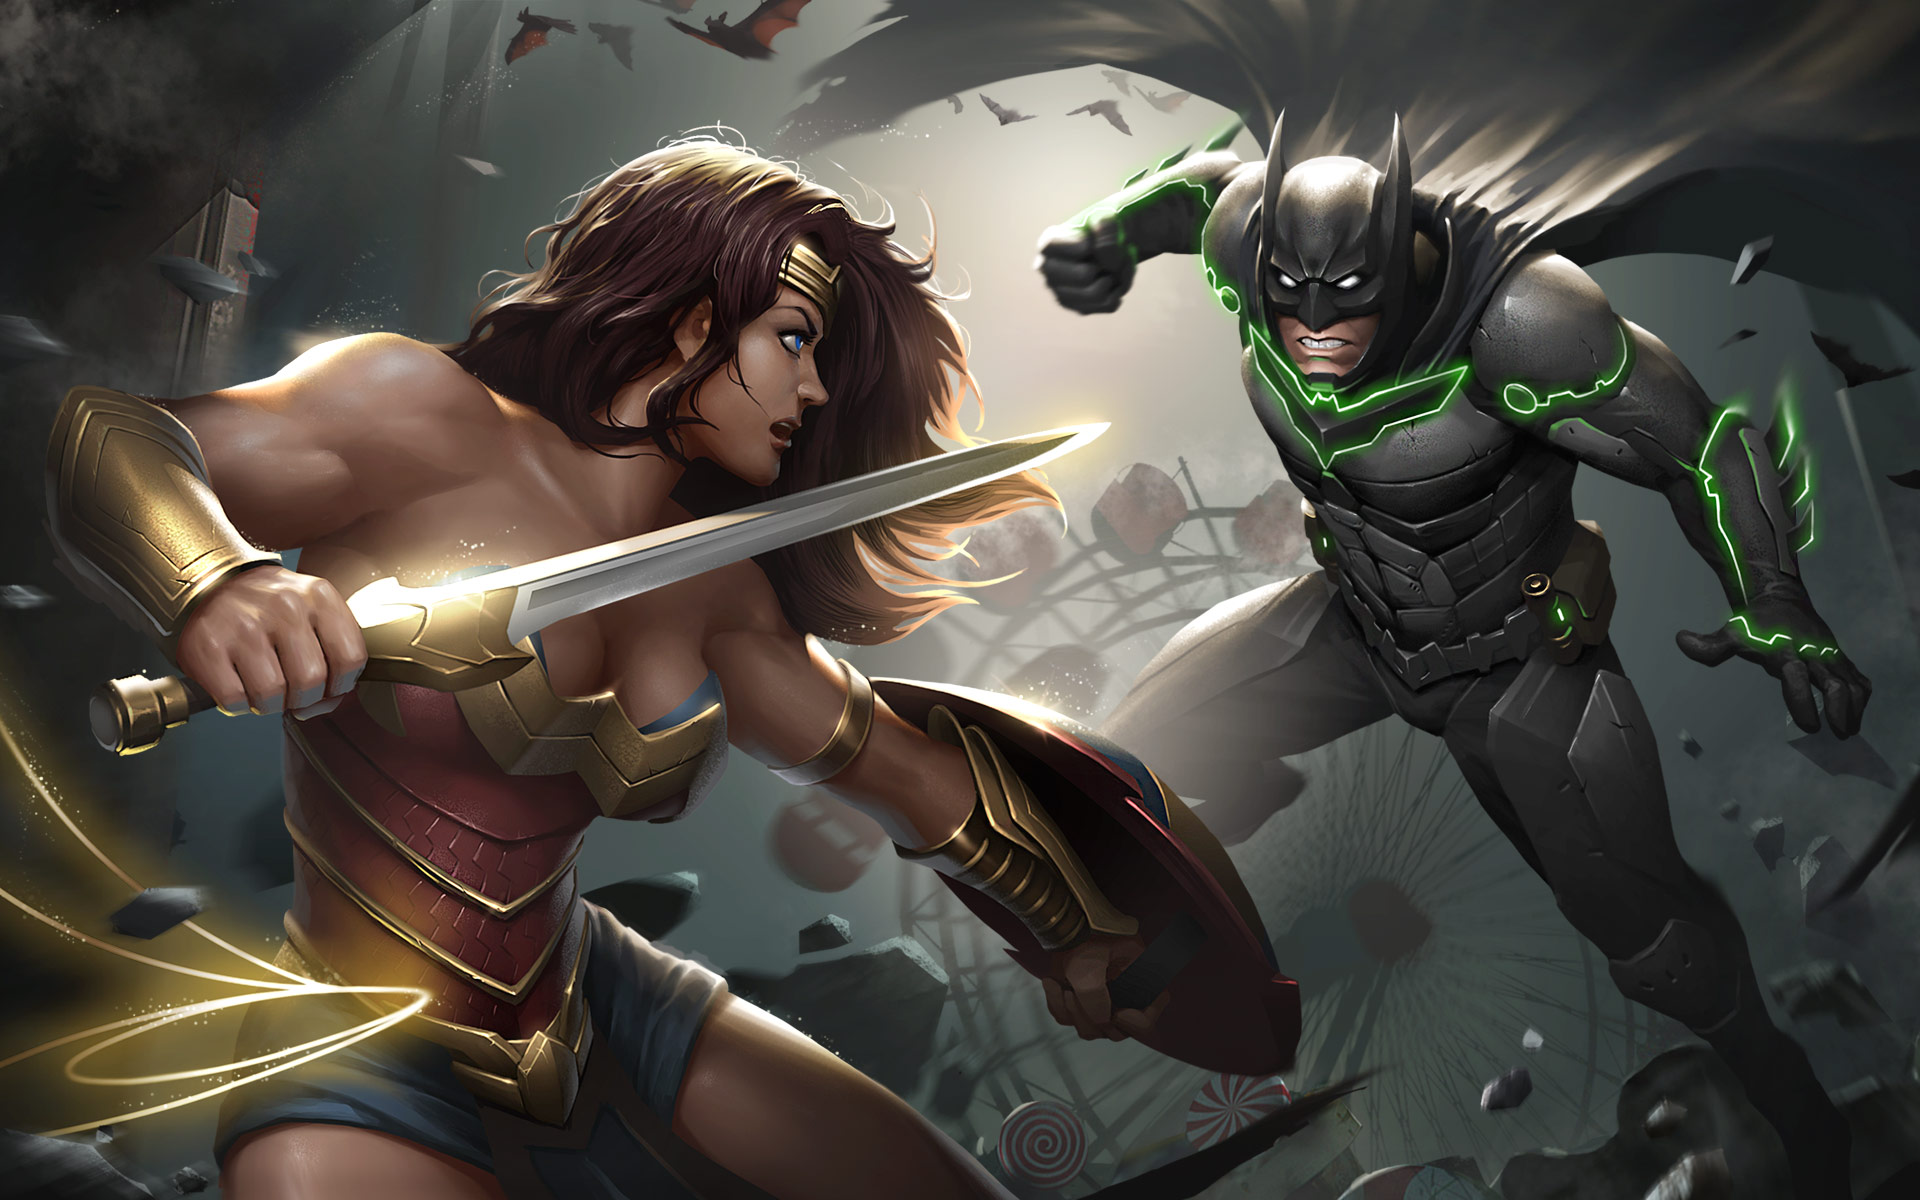 Wallpaper Injustice 2, Video Game, Wonder Woman, Batman, - Injustice 2 Wonder Woman - HD Wallpaper